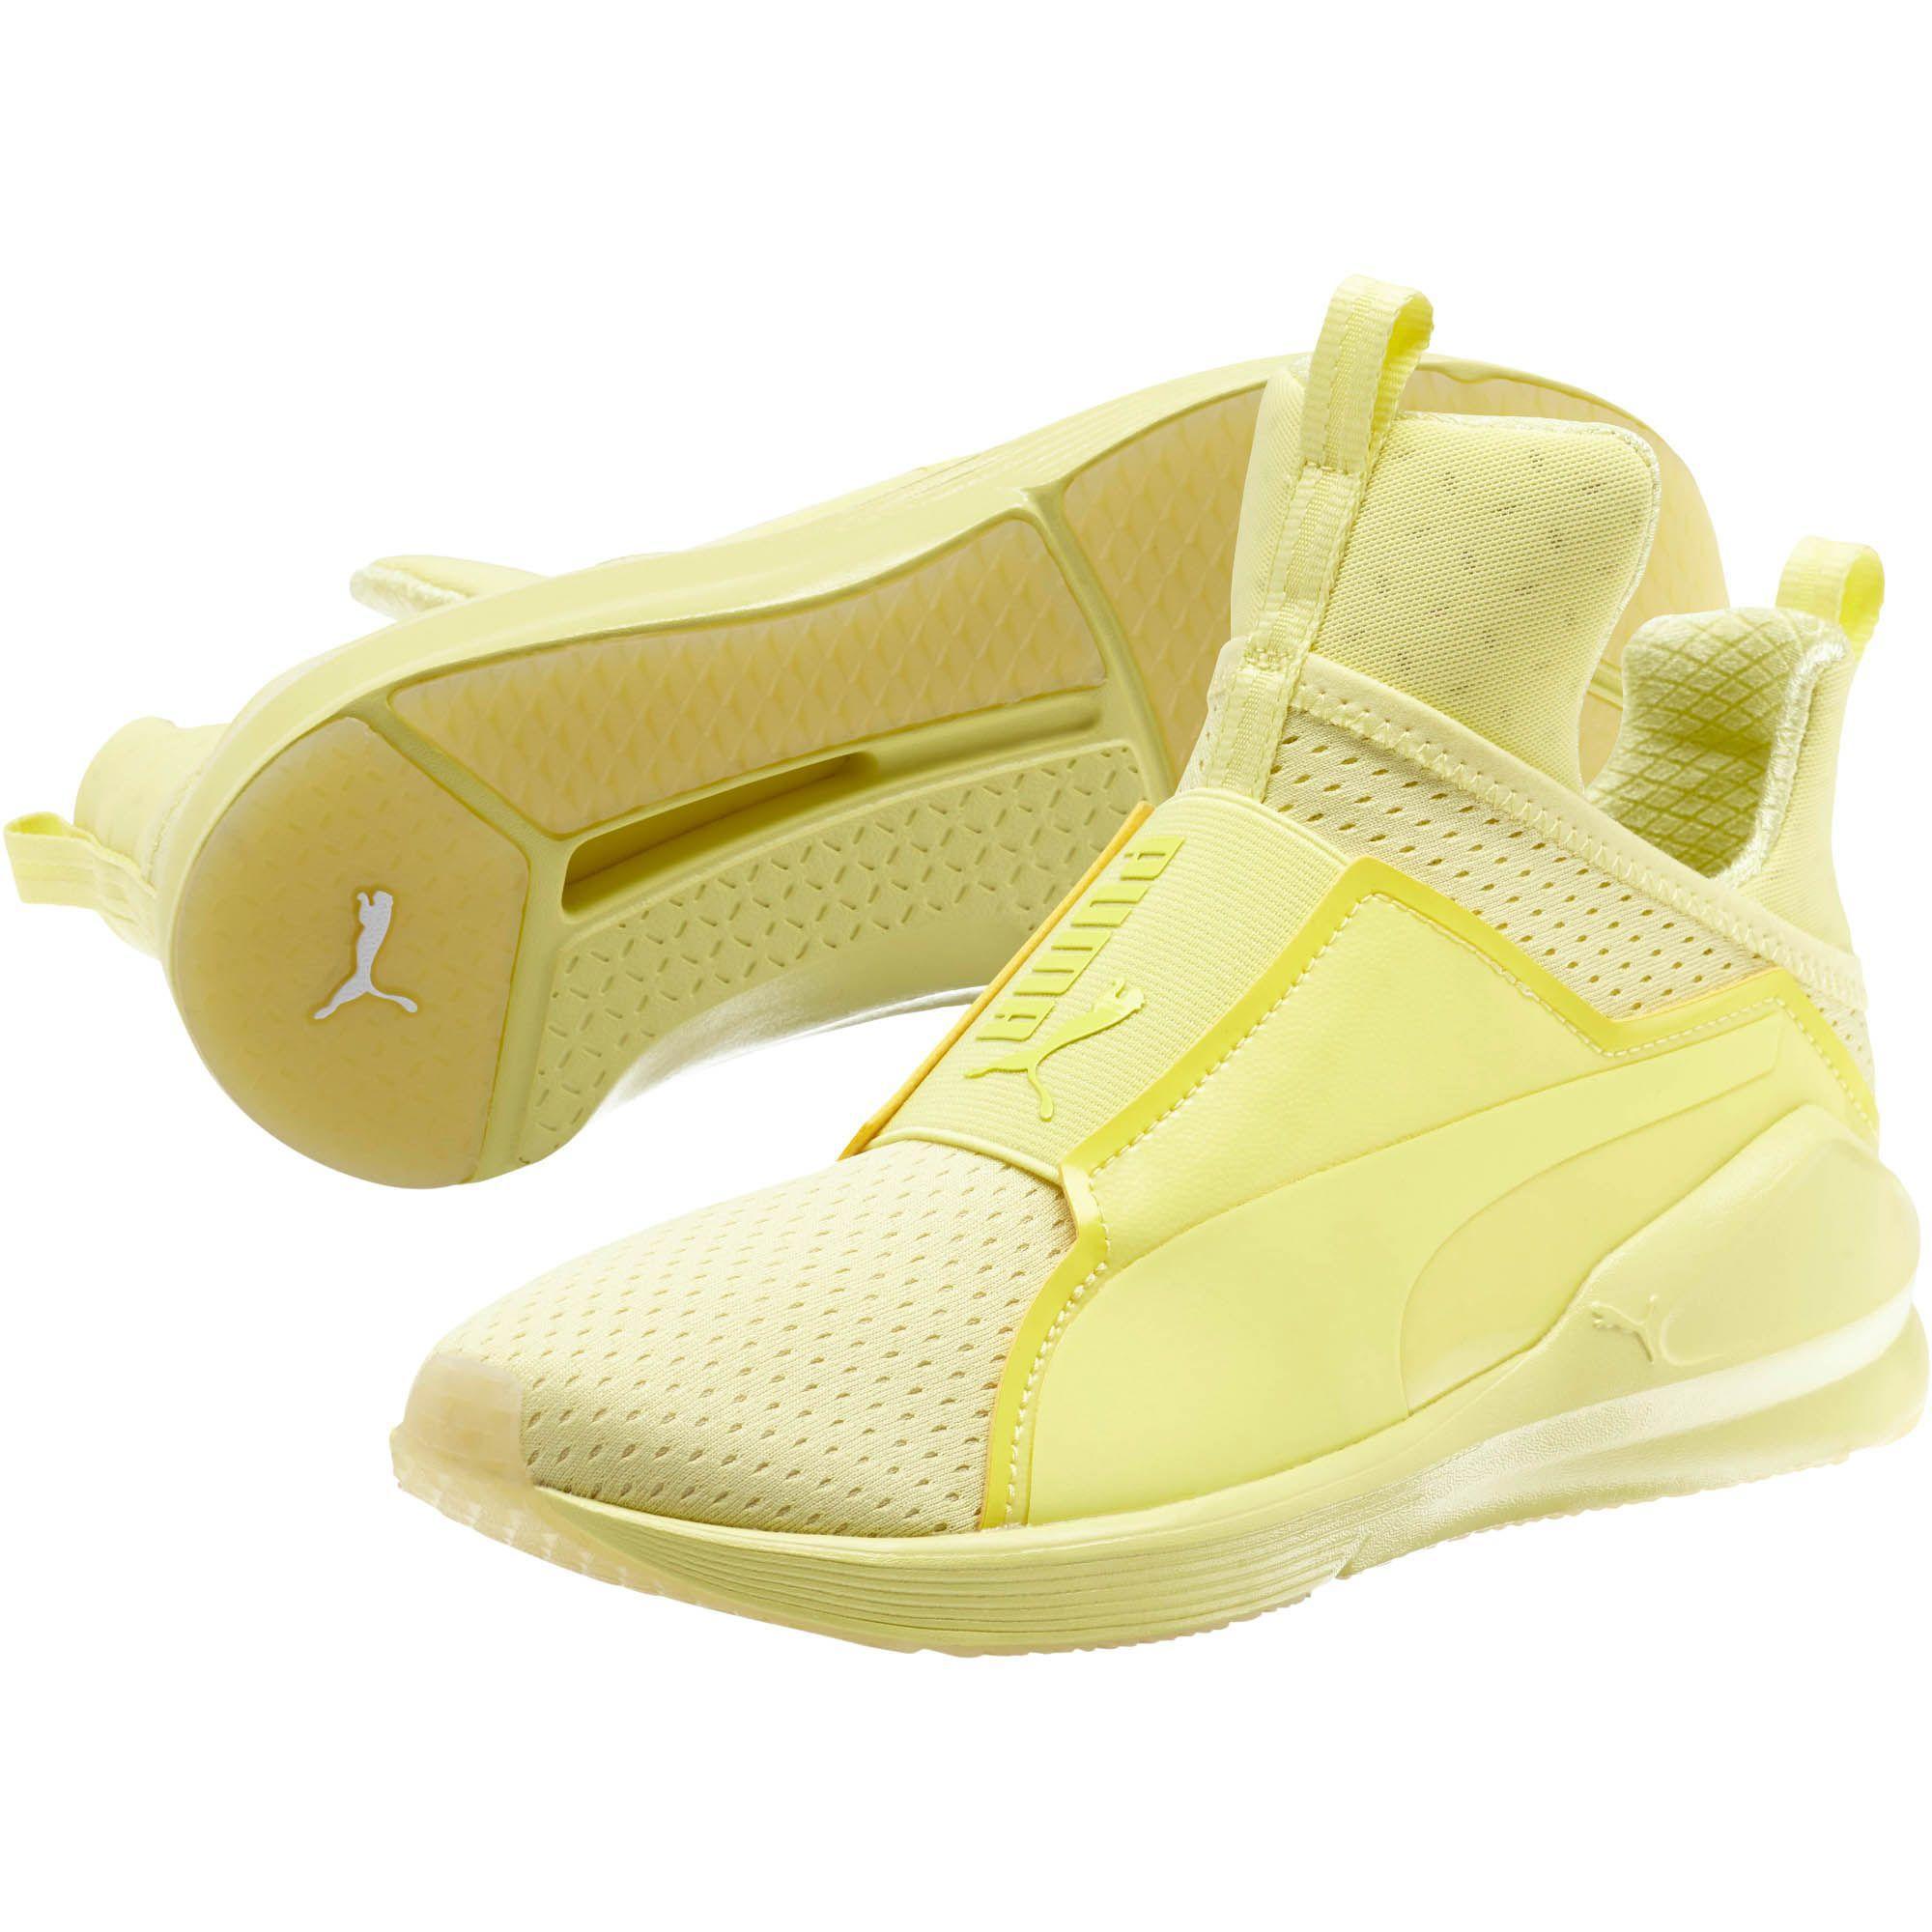 Degrees Women S Training Shoes